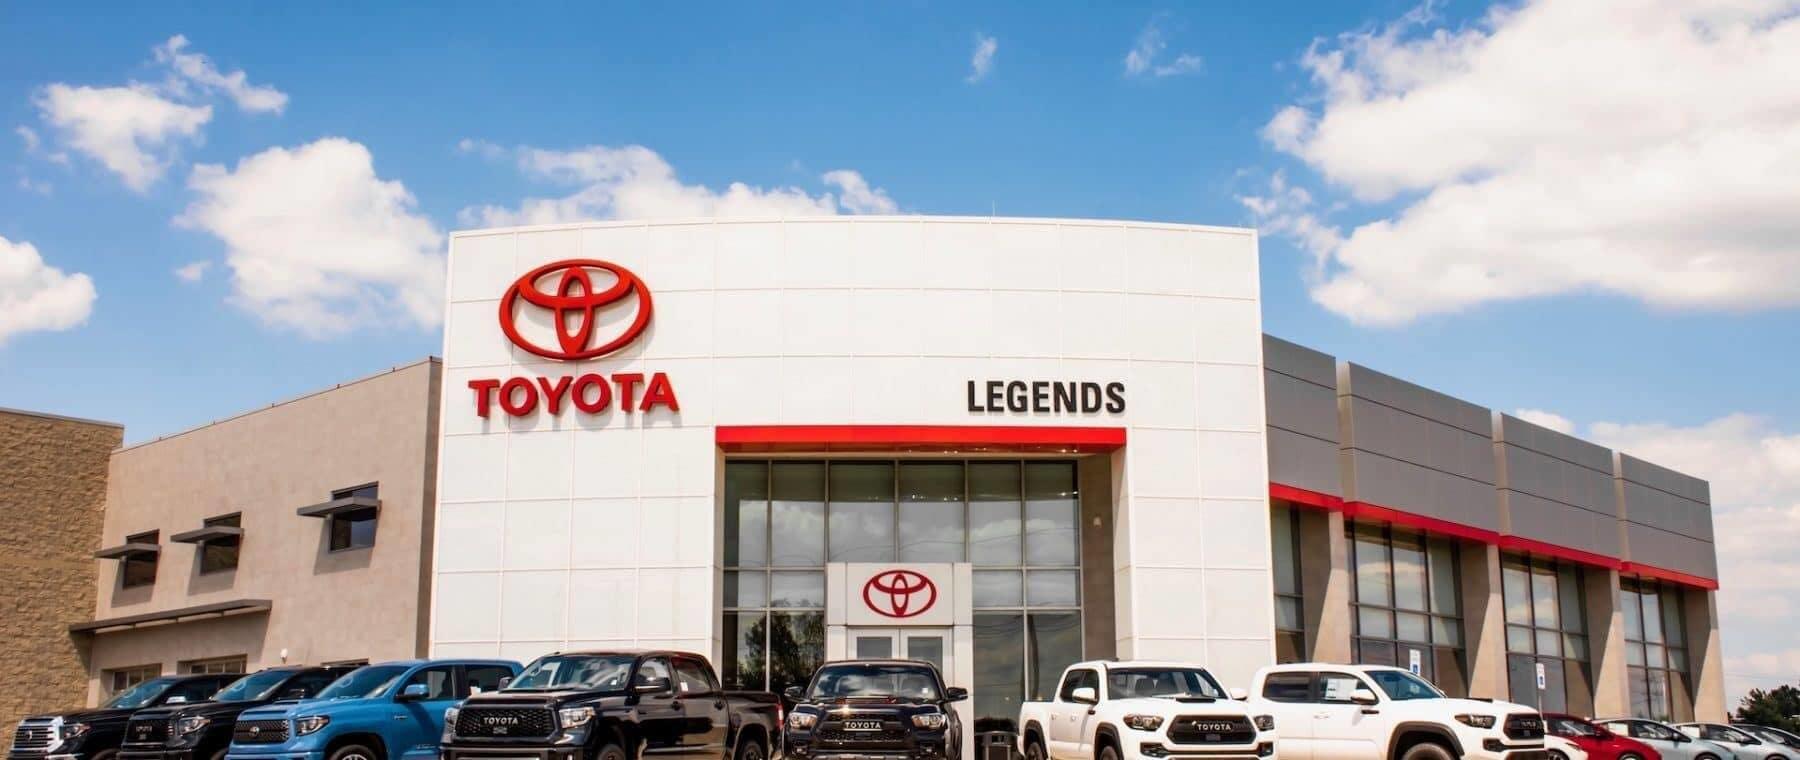 Toyota Legends